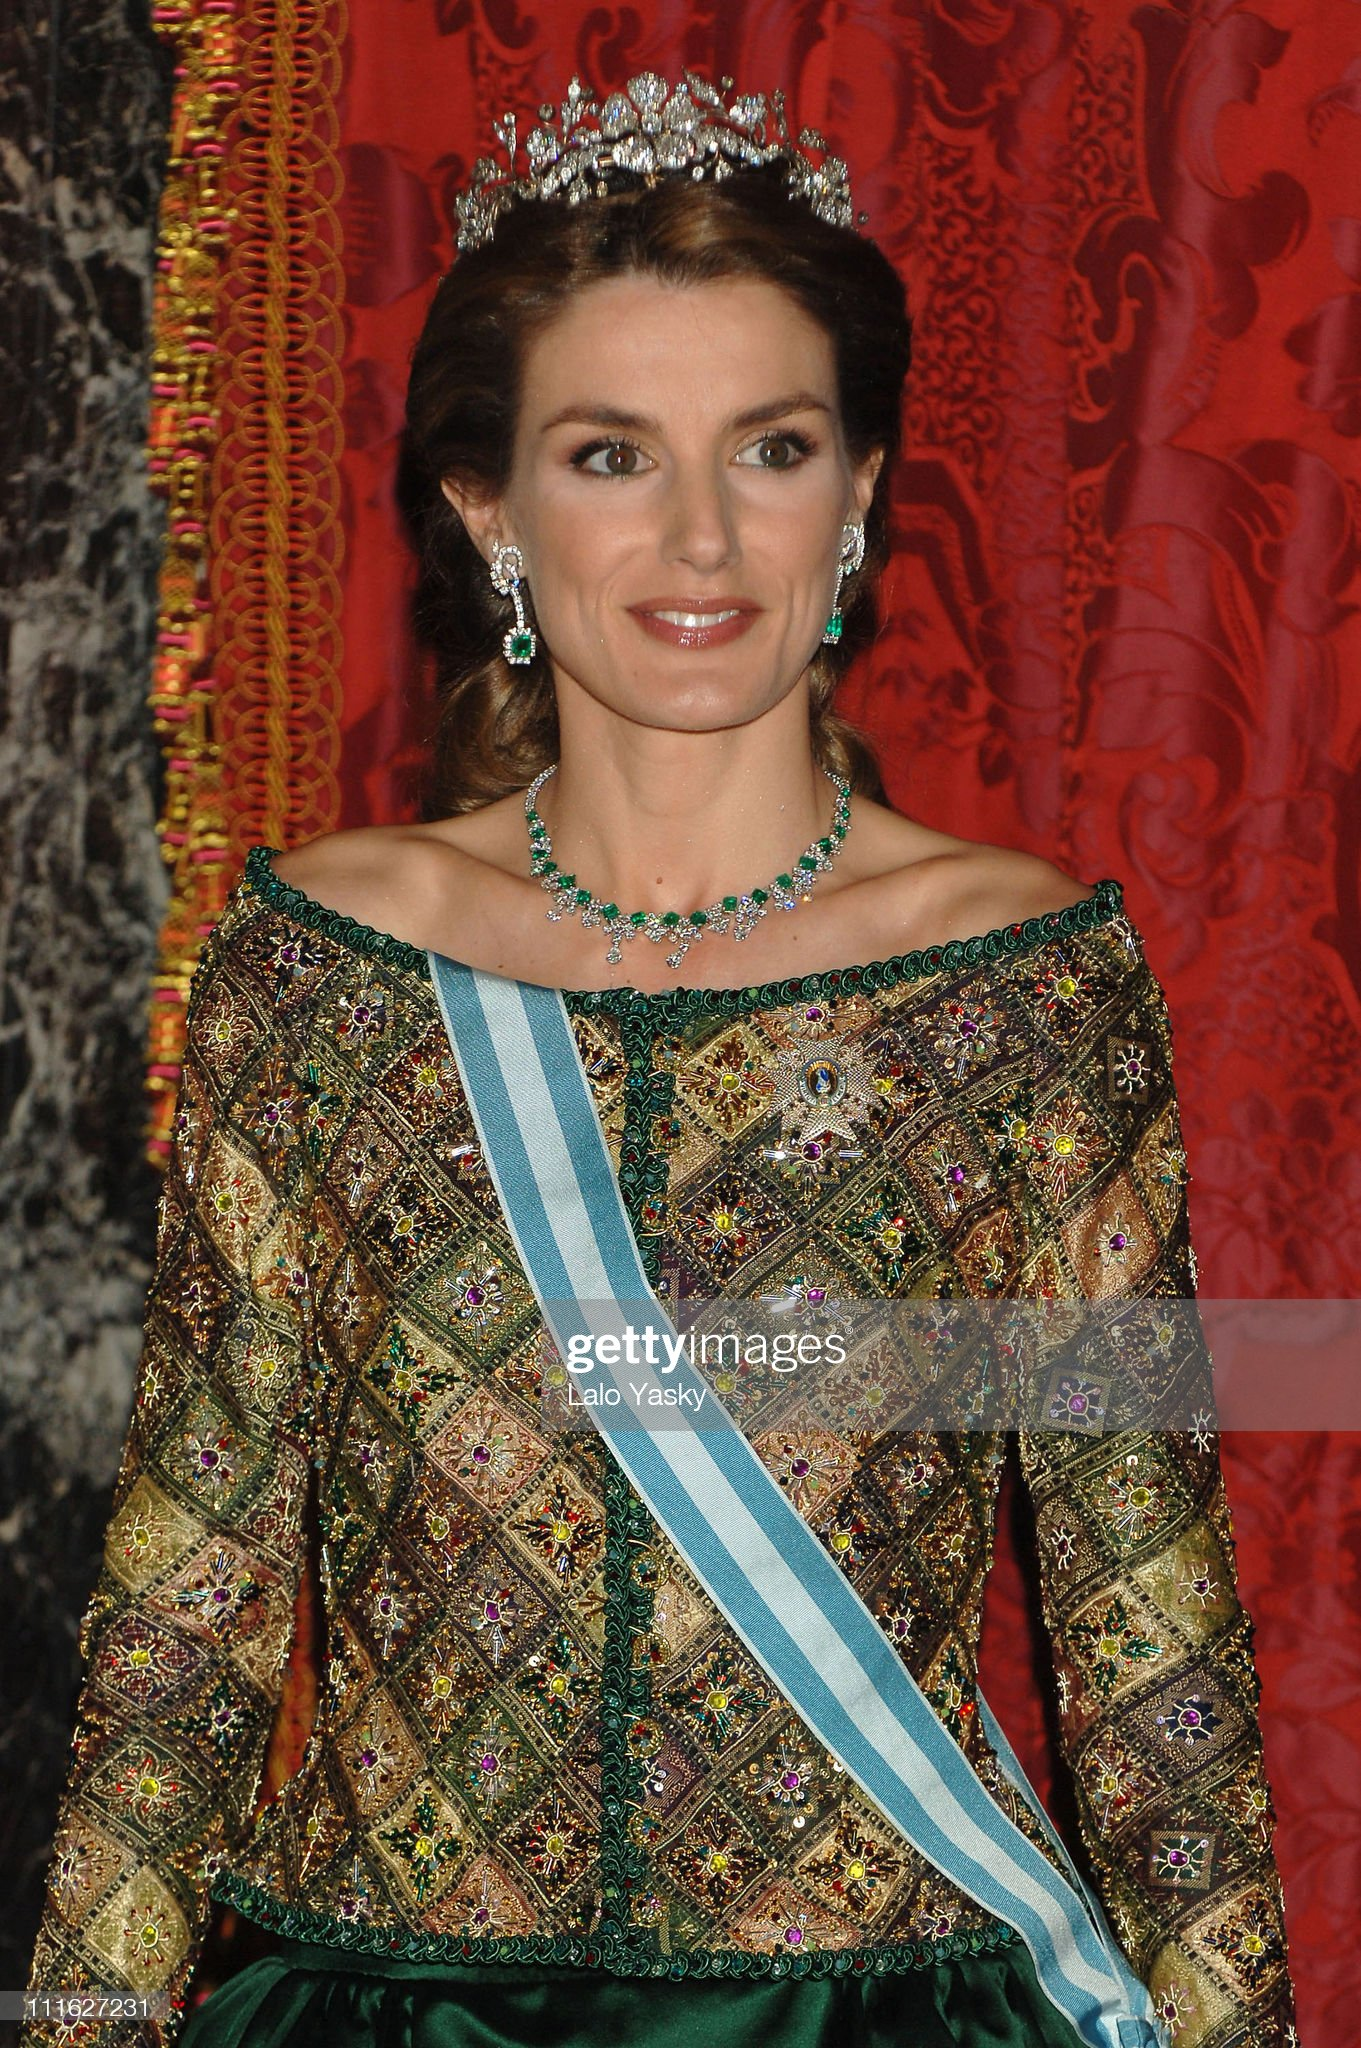 Вечерние наряды Королевы Летиции Spanish Royals Receive Vladimir Putin and Wife - February 9, 2006 : News Photo